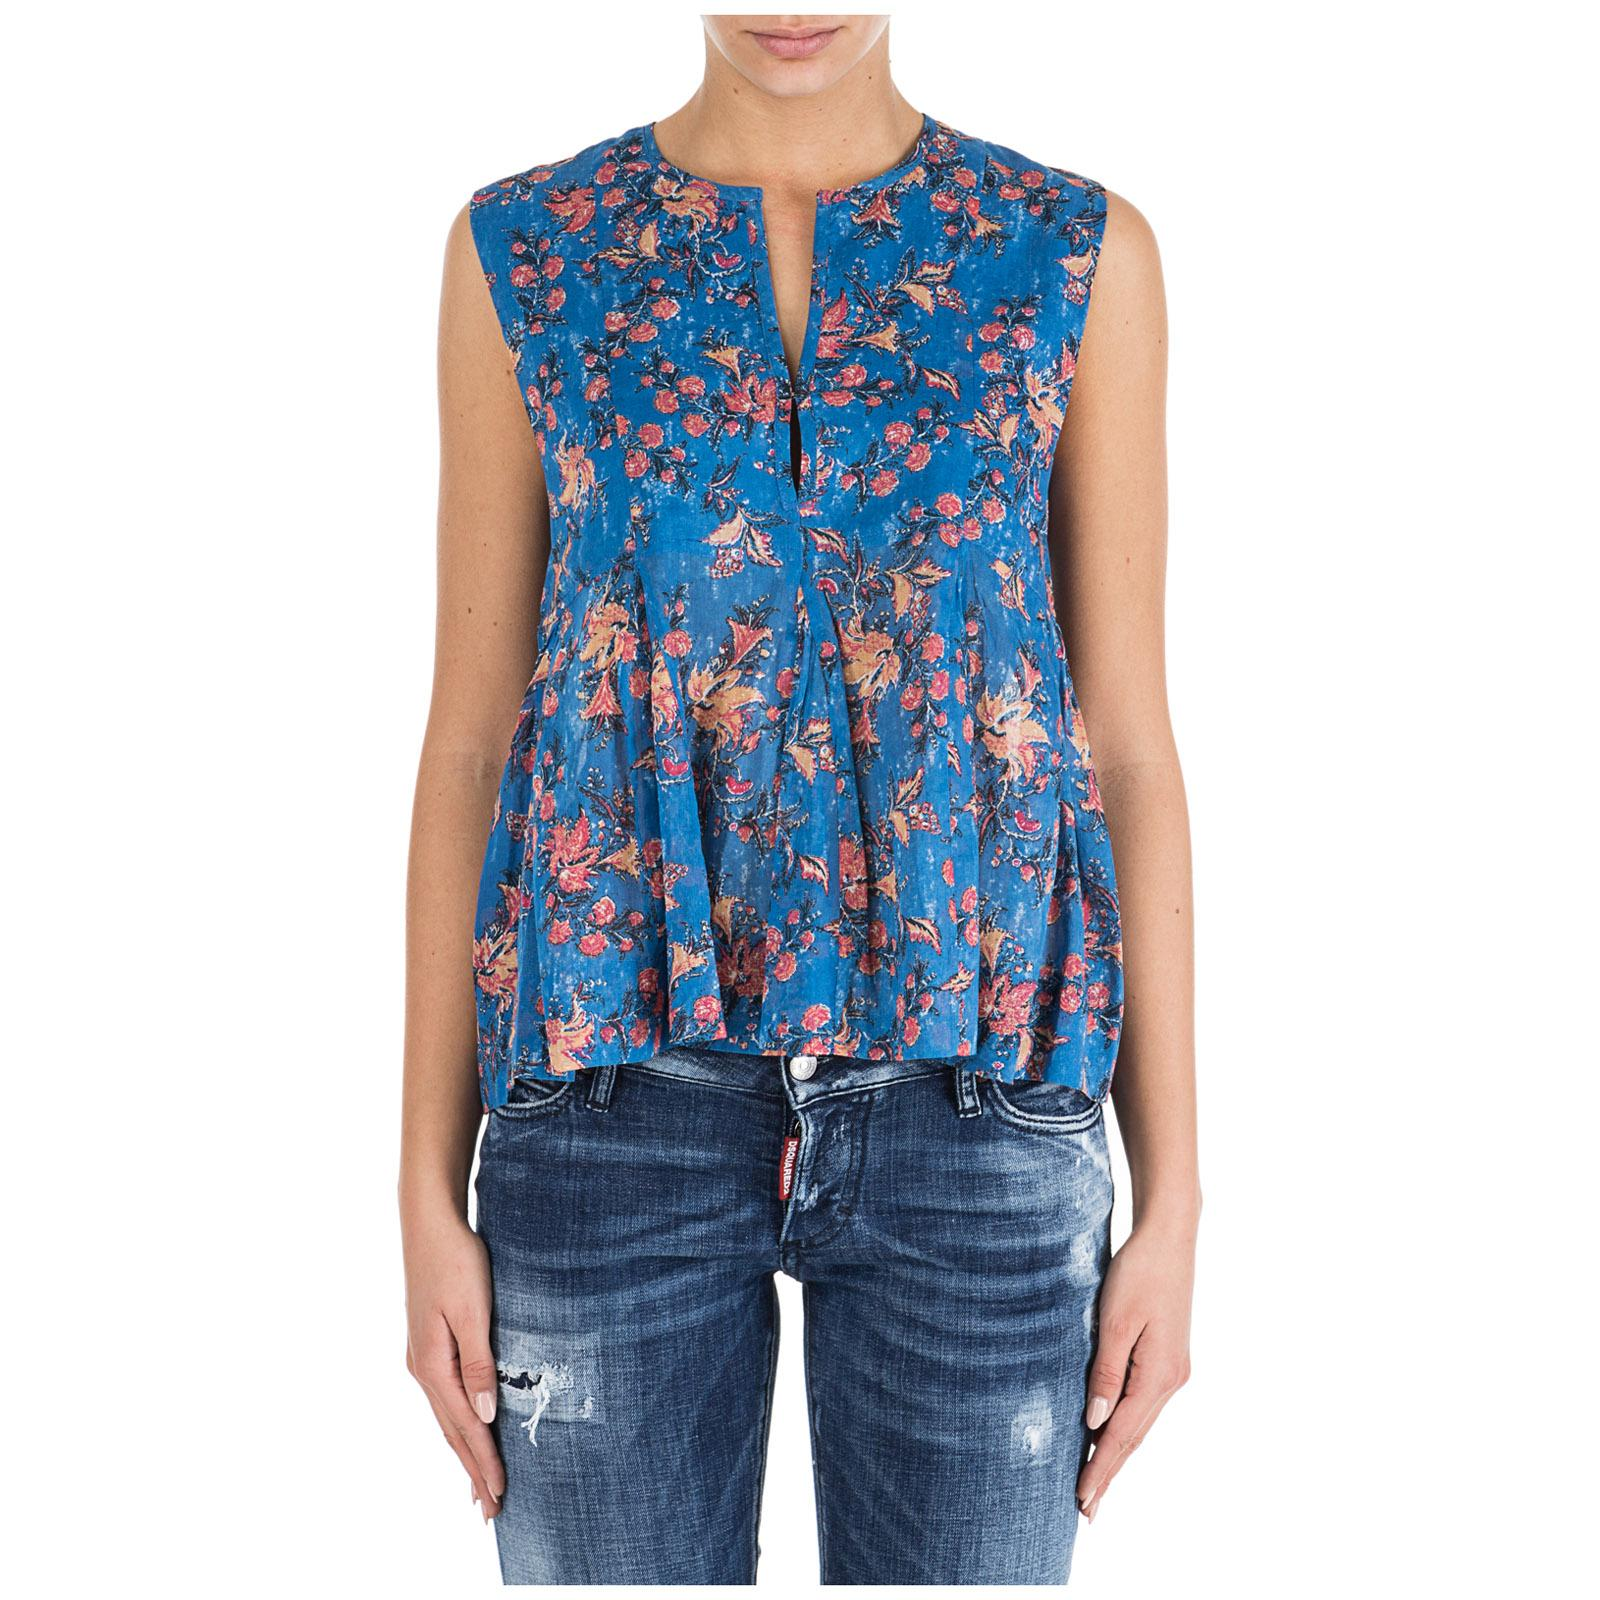 08dfd7e99b7 Étoile Isabel Marant. Women's Erney Sleeveless Floral Blouse - Blue ...